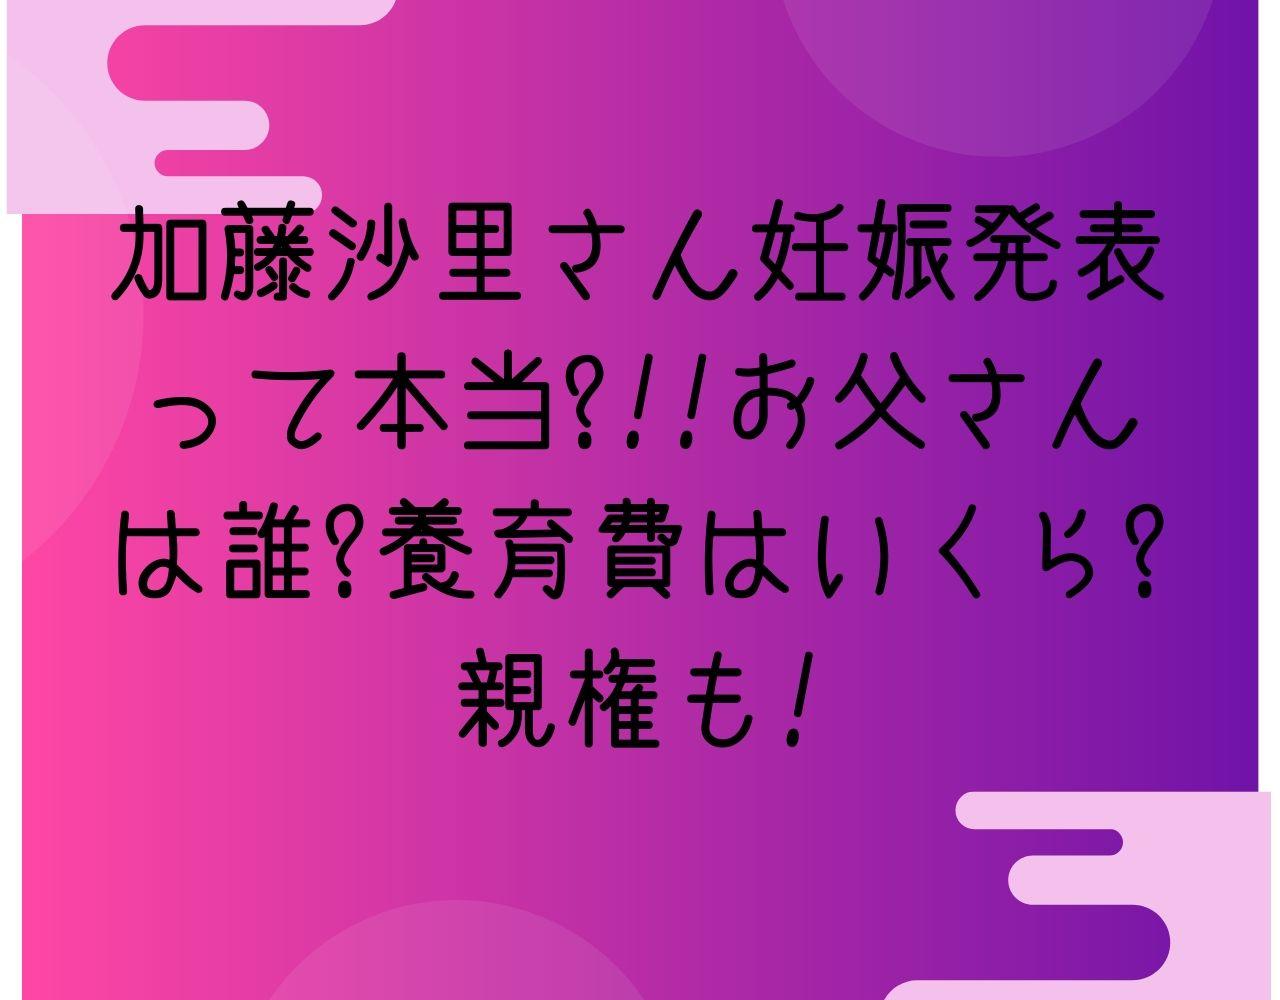 加藤沙里さん妊娠発覚